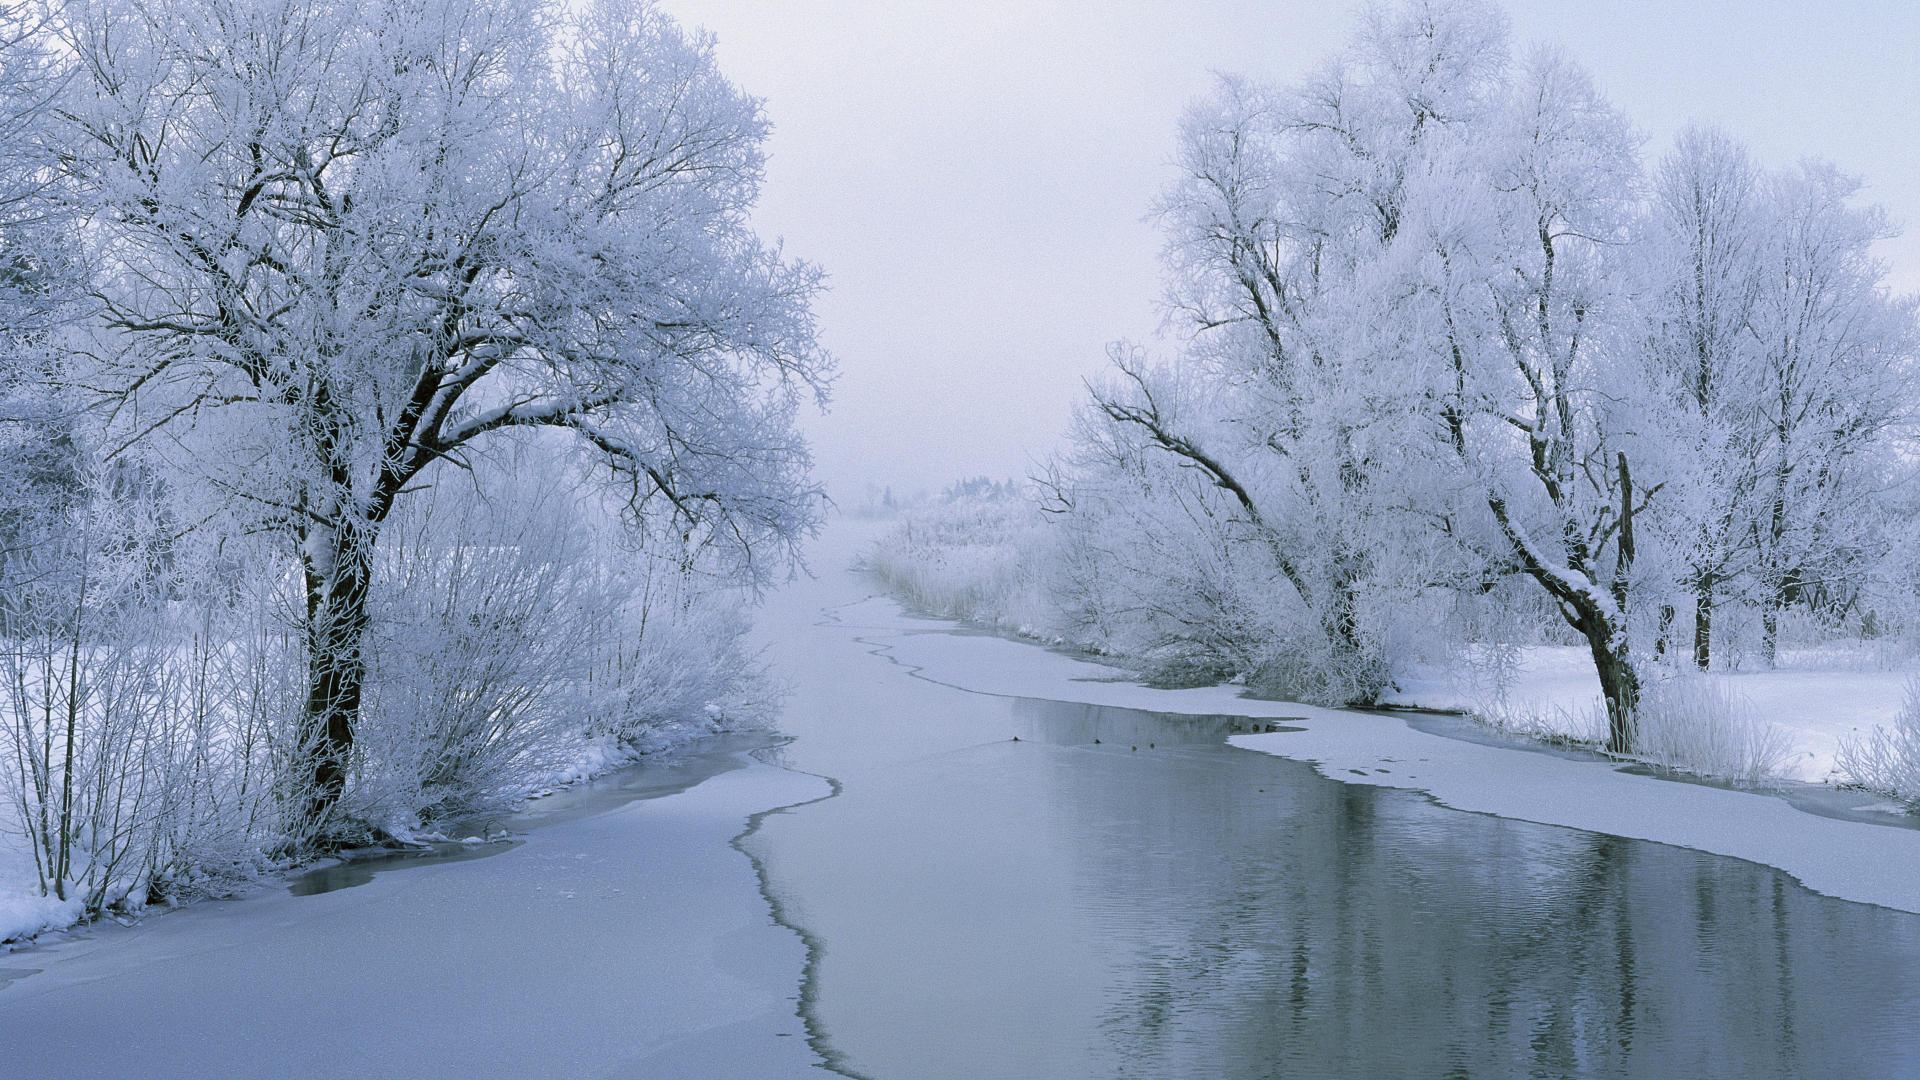 Зима обои на рабочий стол 1920x1080 №727750